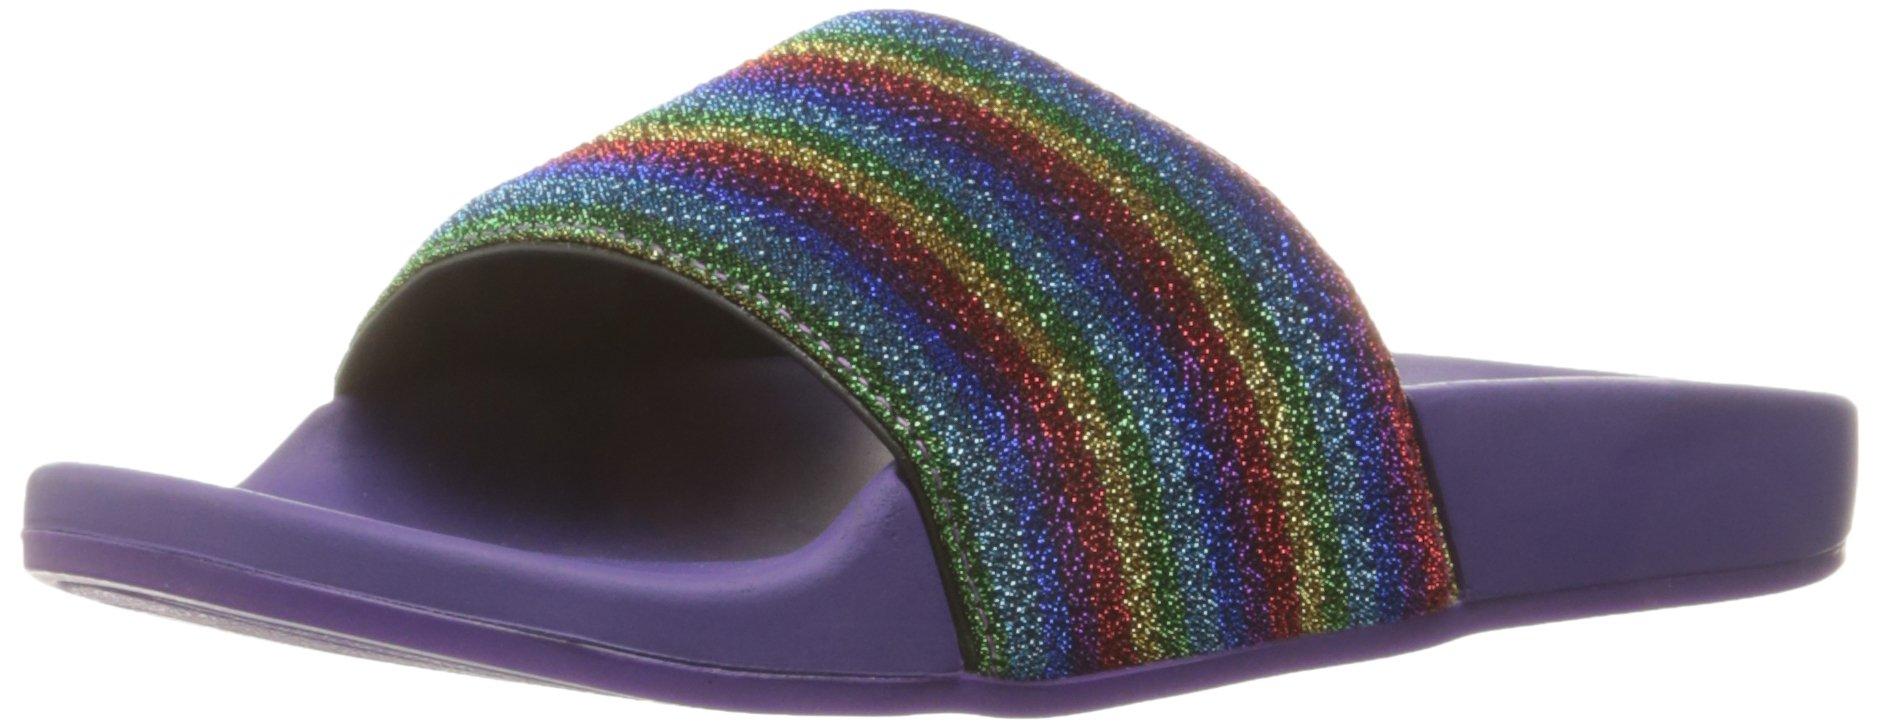 Marc Jacobs Women's Cooper Sport Slide Slipper, Purple Multi, 37 EU/7 M US